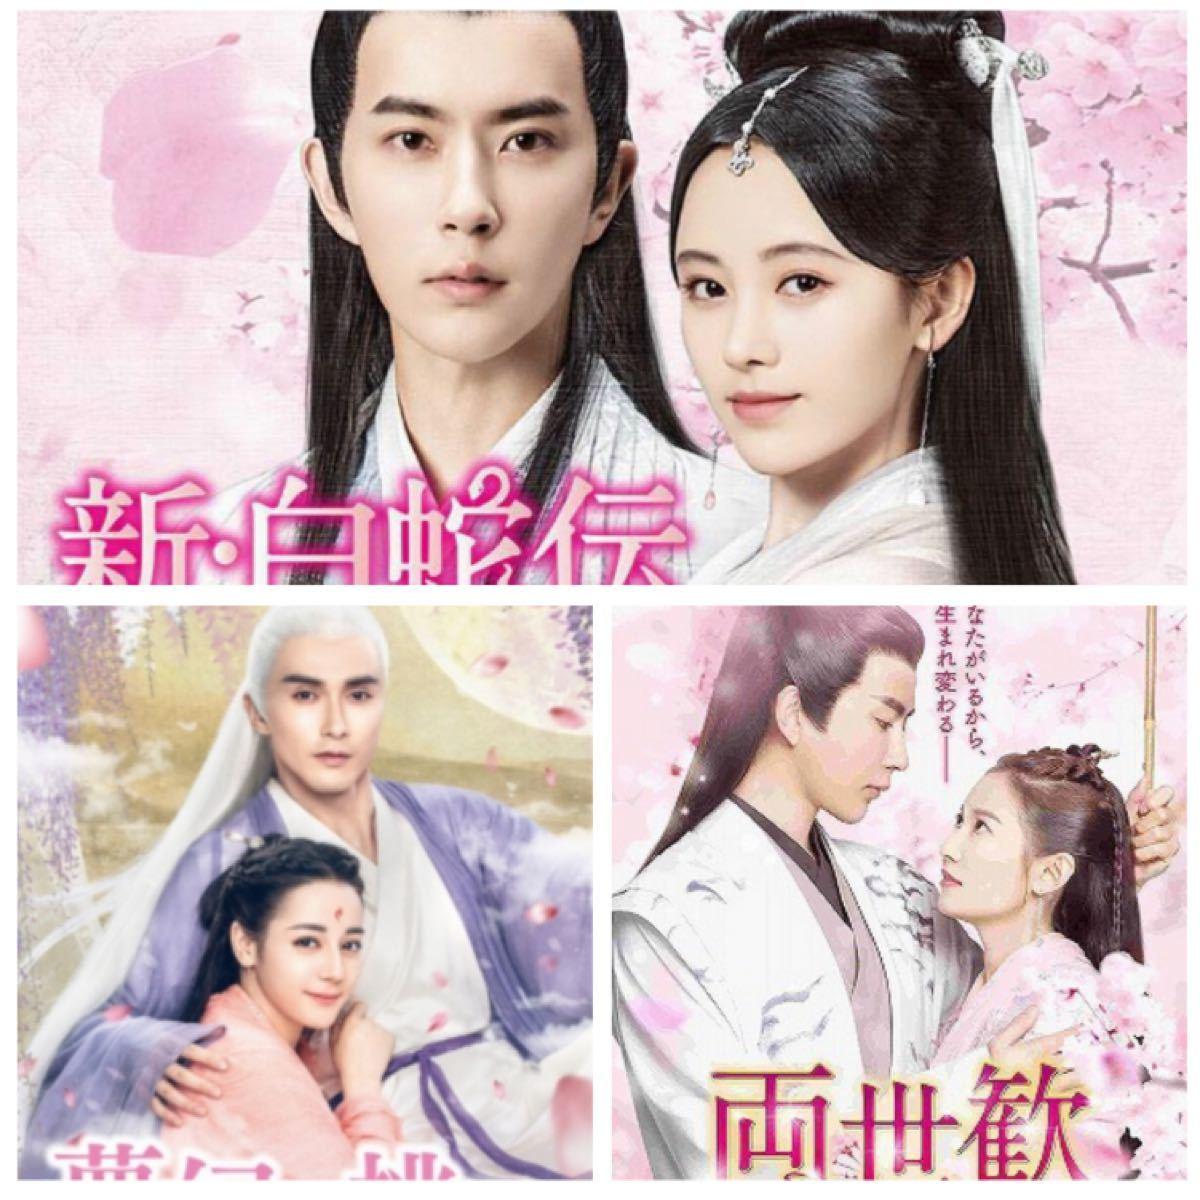 (Blu-ray)新白蛇伝、夢幻の桃花、両世歓 3作品セット価格